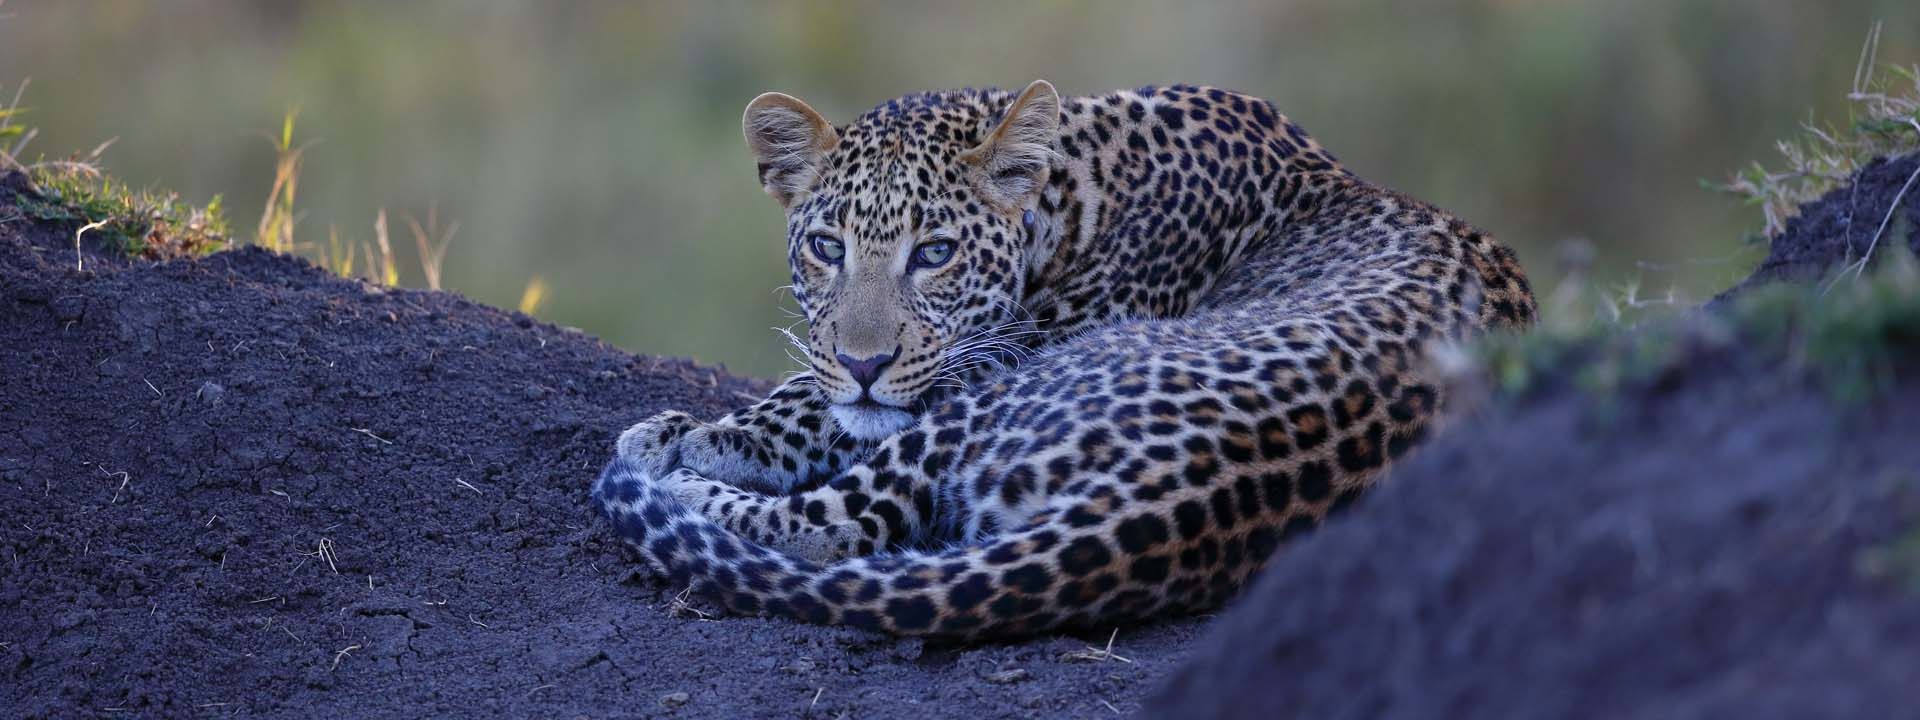 Kenia Reise, Leopard